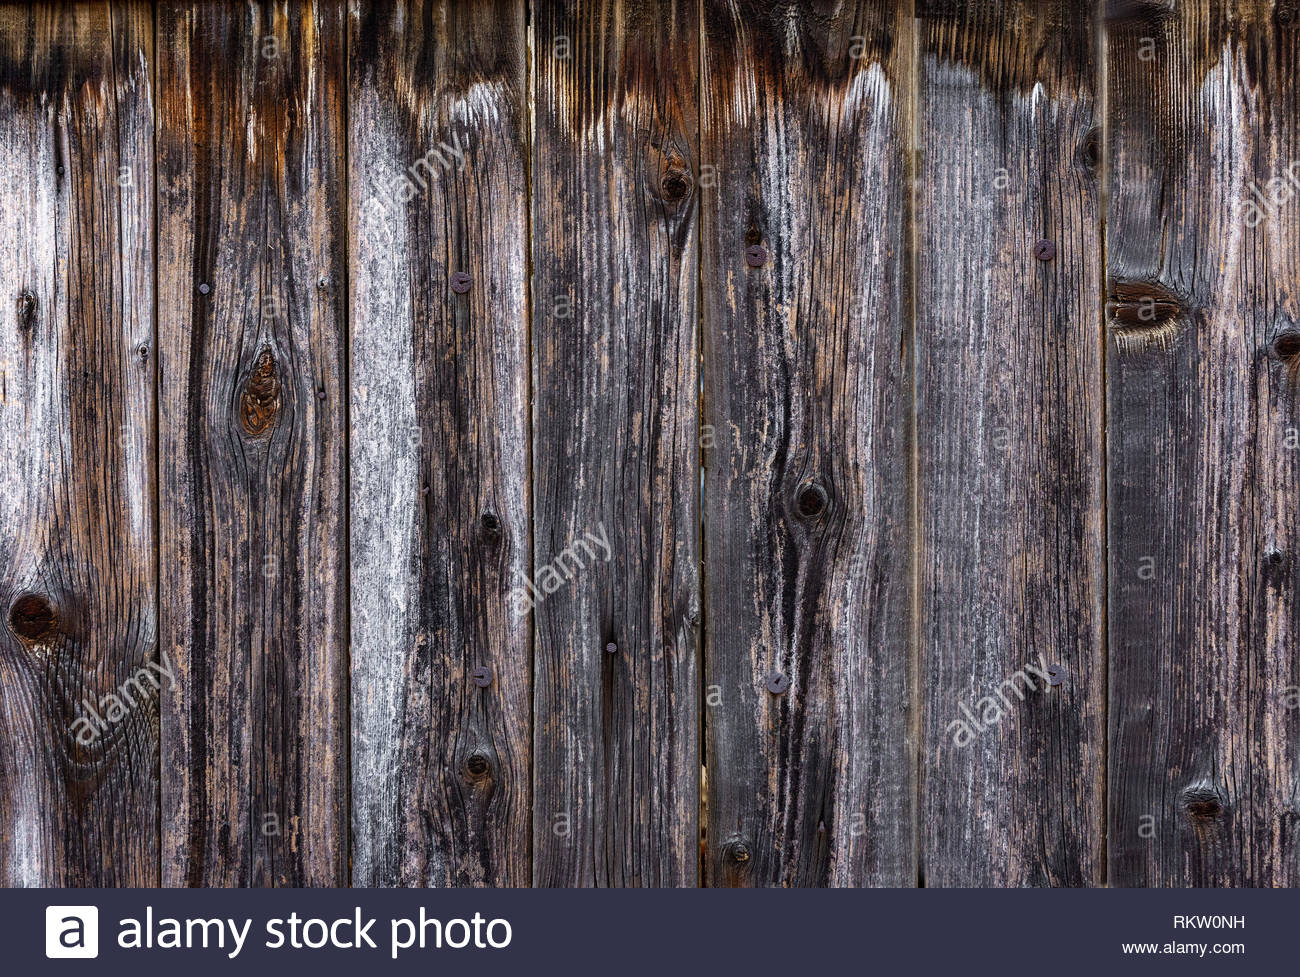 Wood pattern panel background - Stock Image